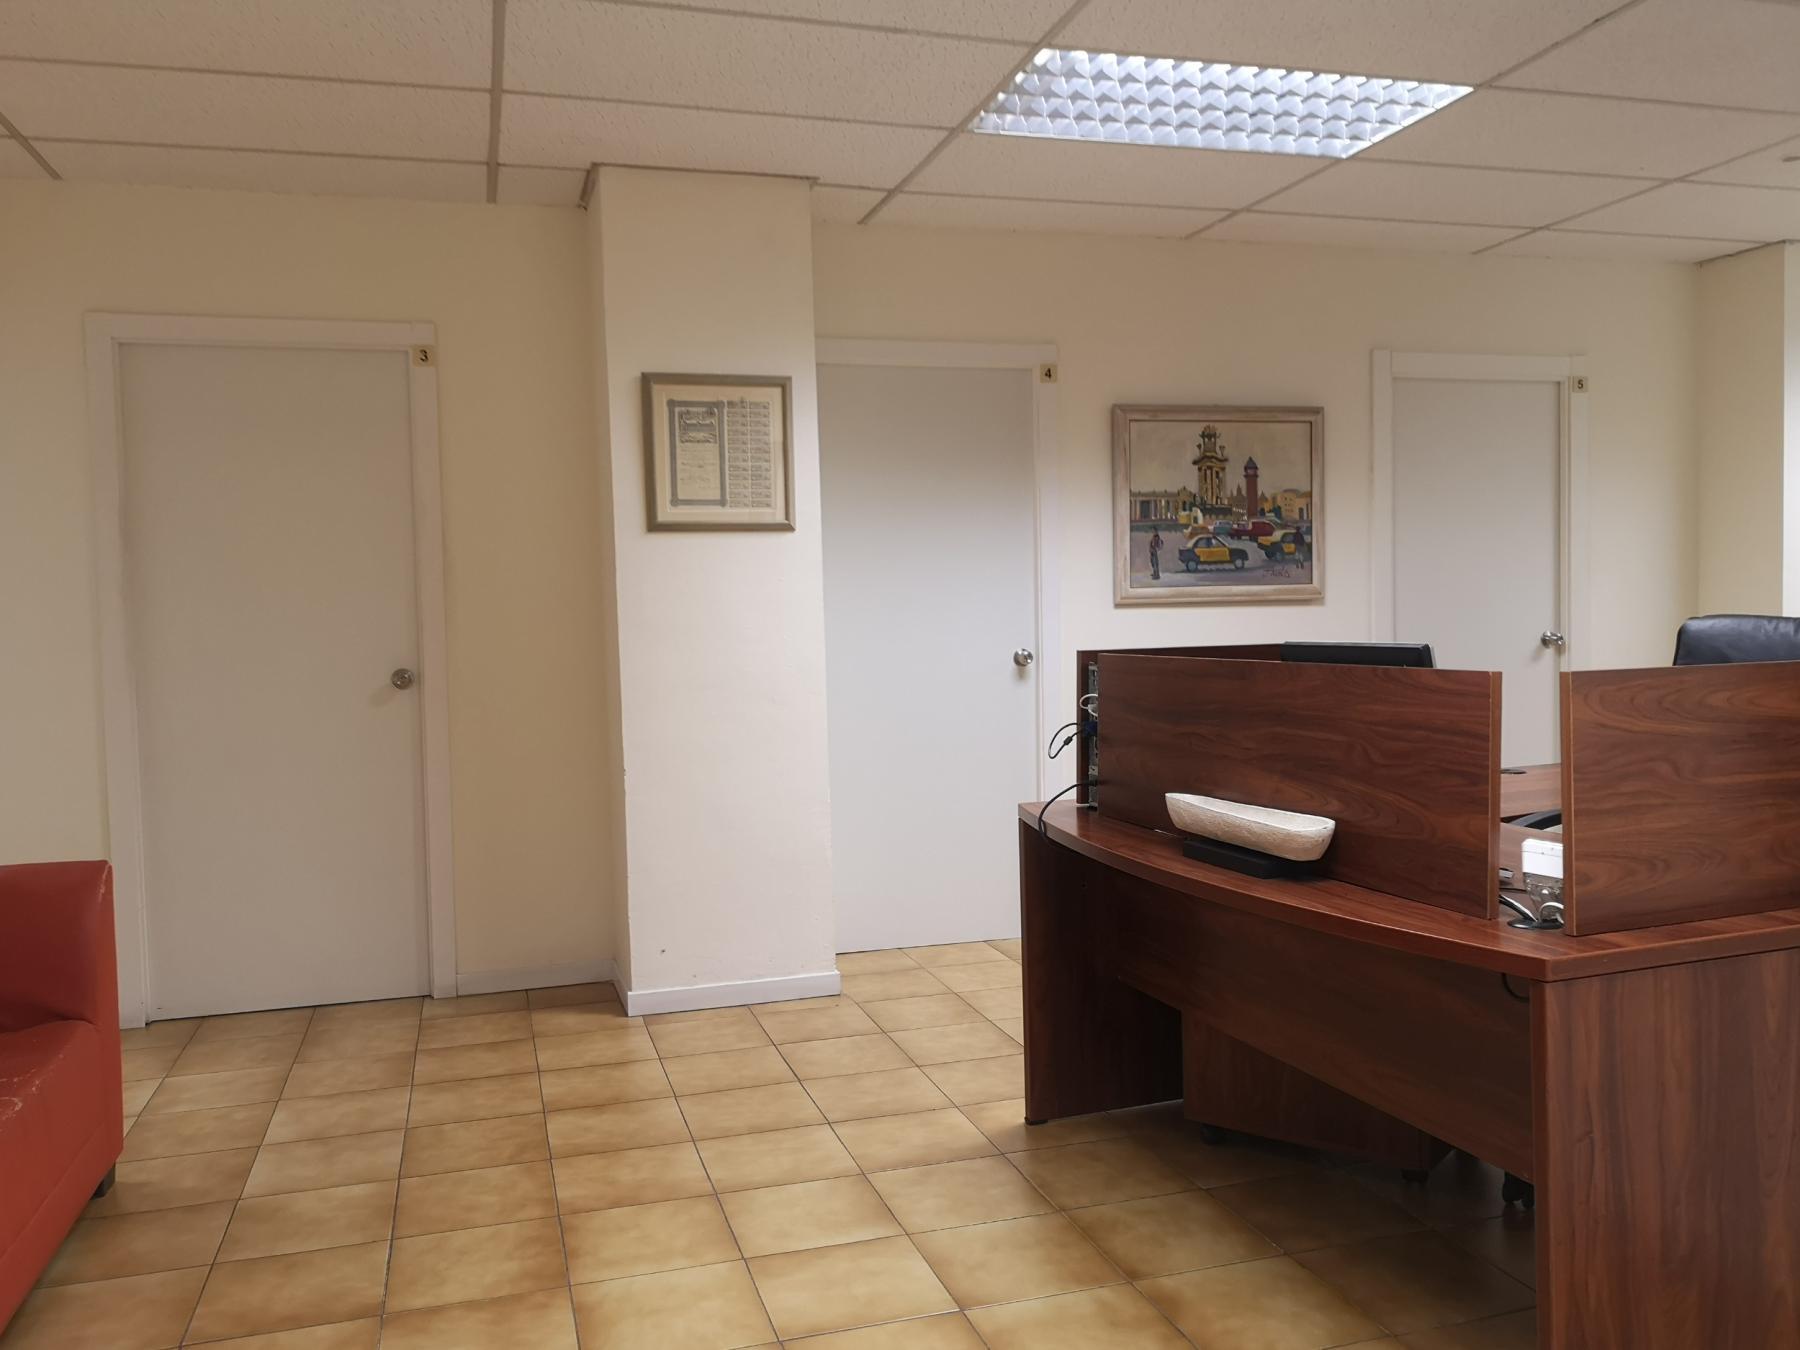 Alquilar oficinas Rambla del Brasil 28-30, Barcelona (3)